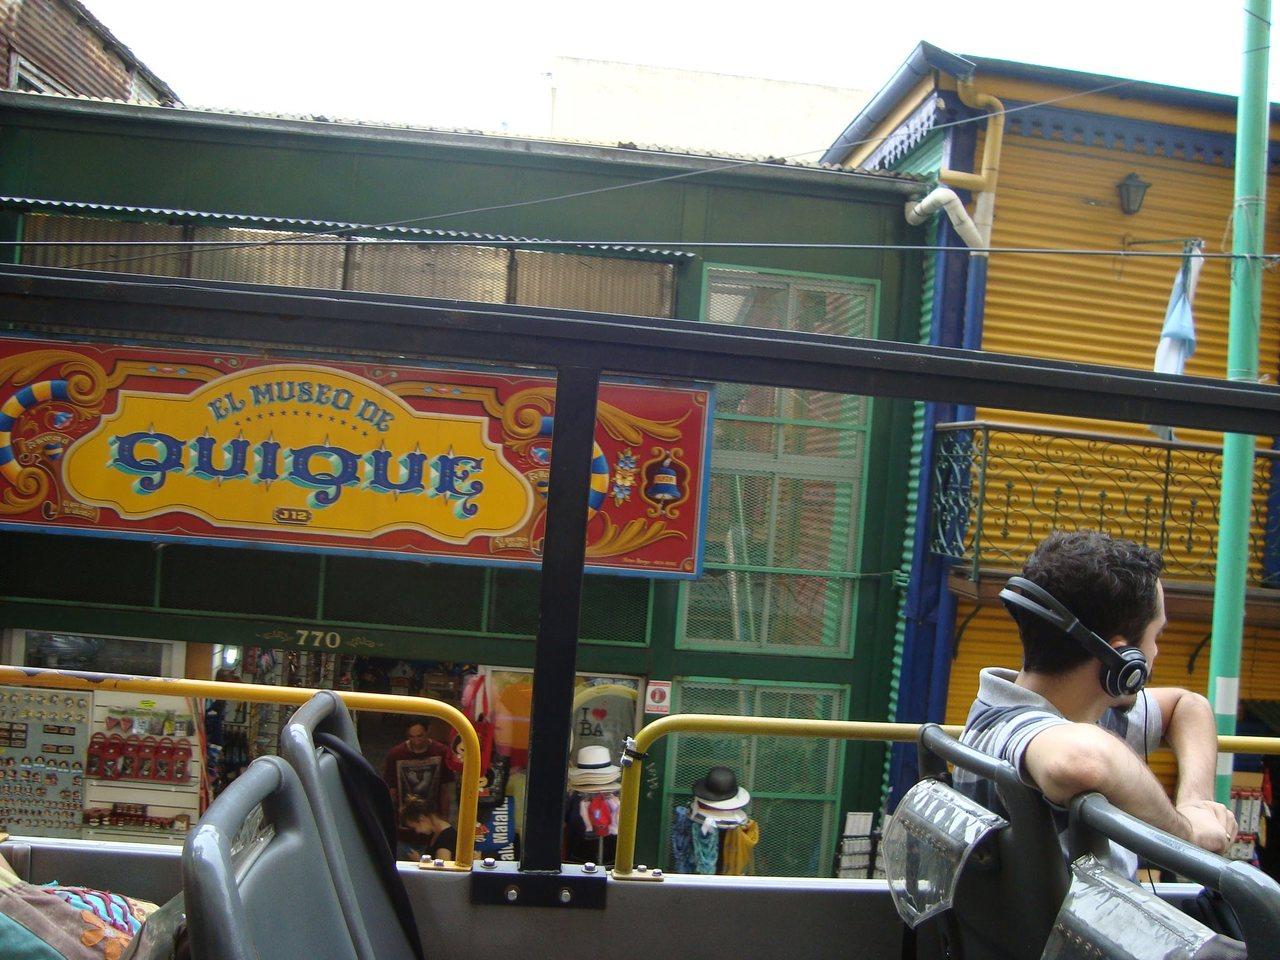 Conhecendo Buenos Aires a bordo do Buenos Aires Bus